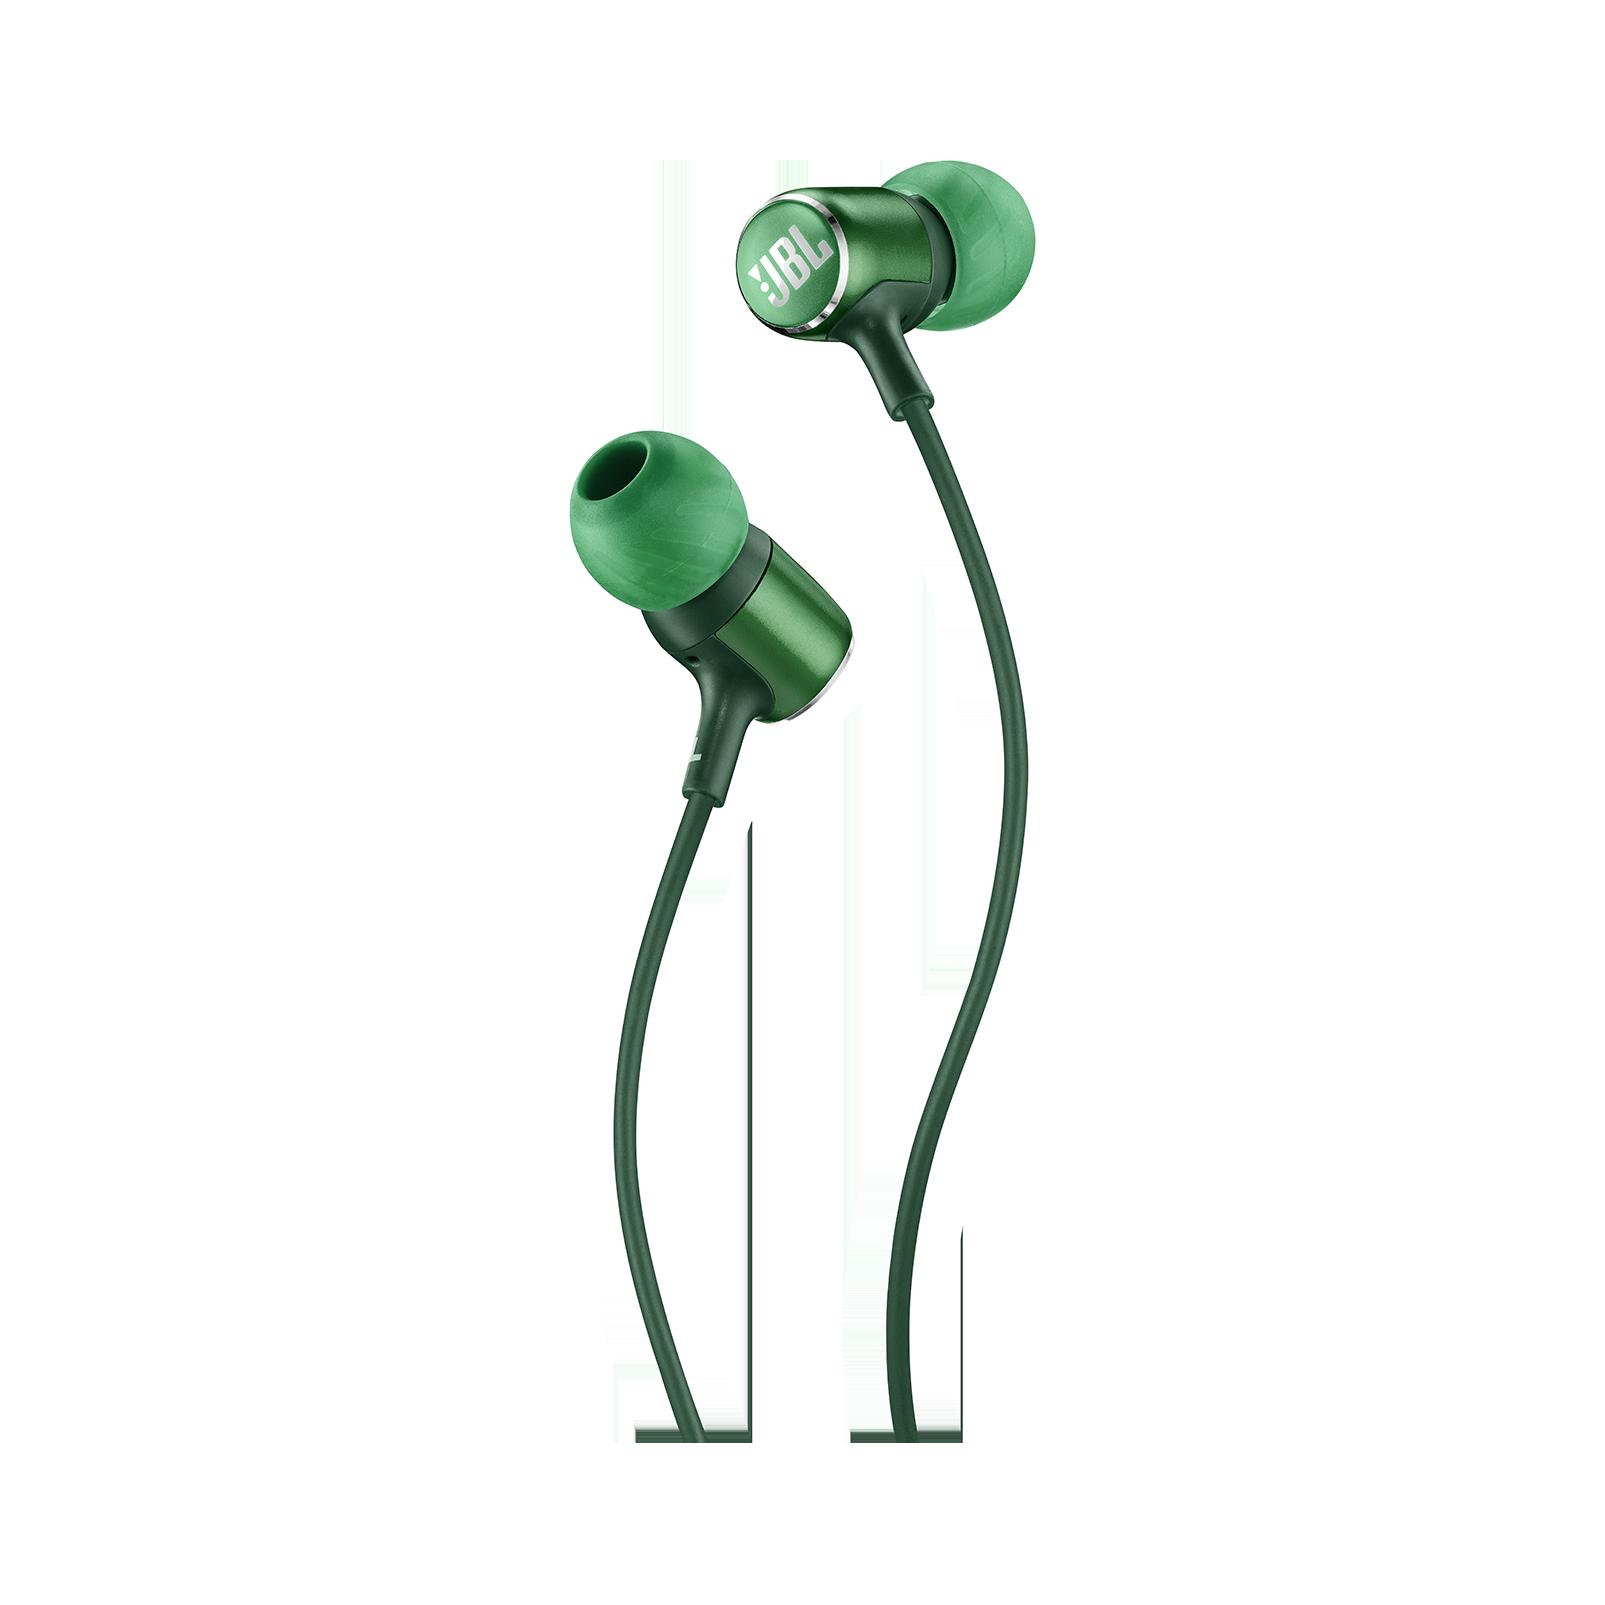 JBL LIVE 100 - Green - In-ear headphones - Detailshot 1